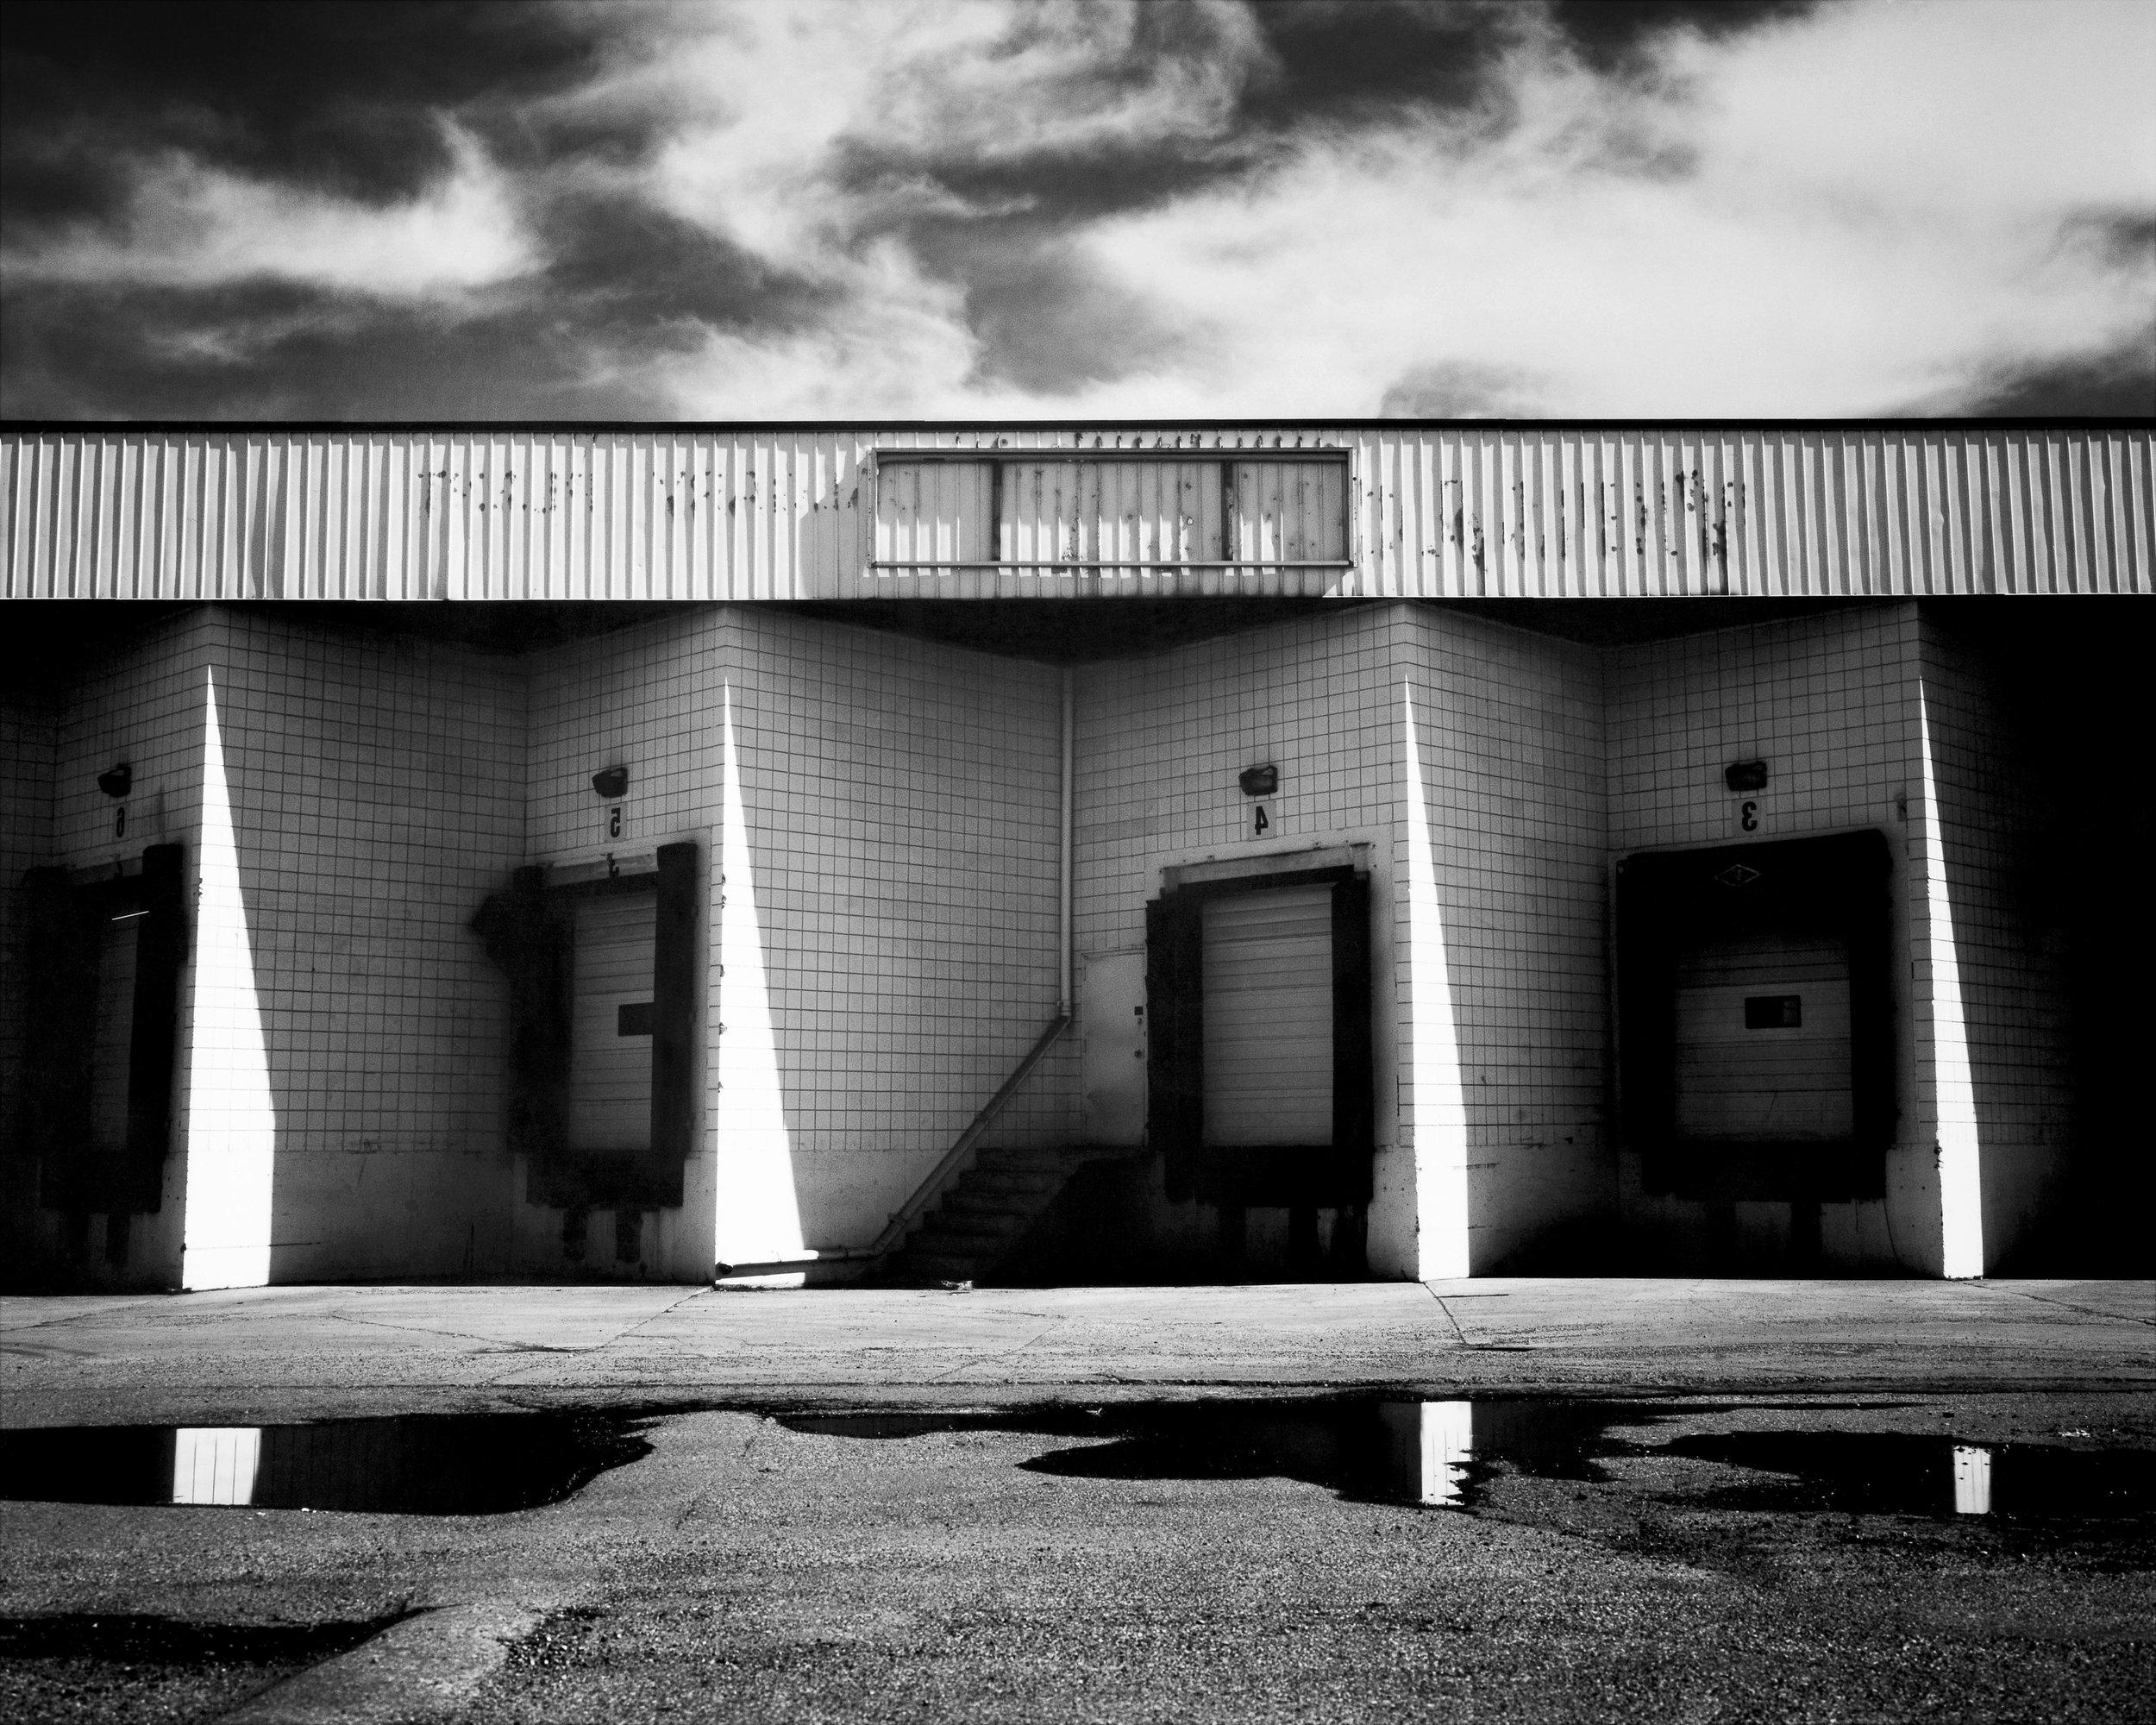 Reproduction - Loading Docks - Print - No Border.jpg